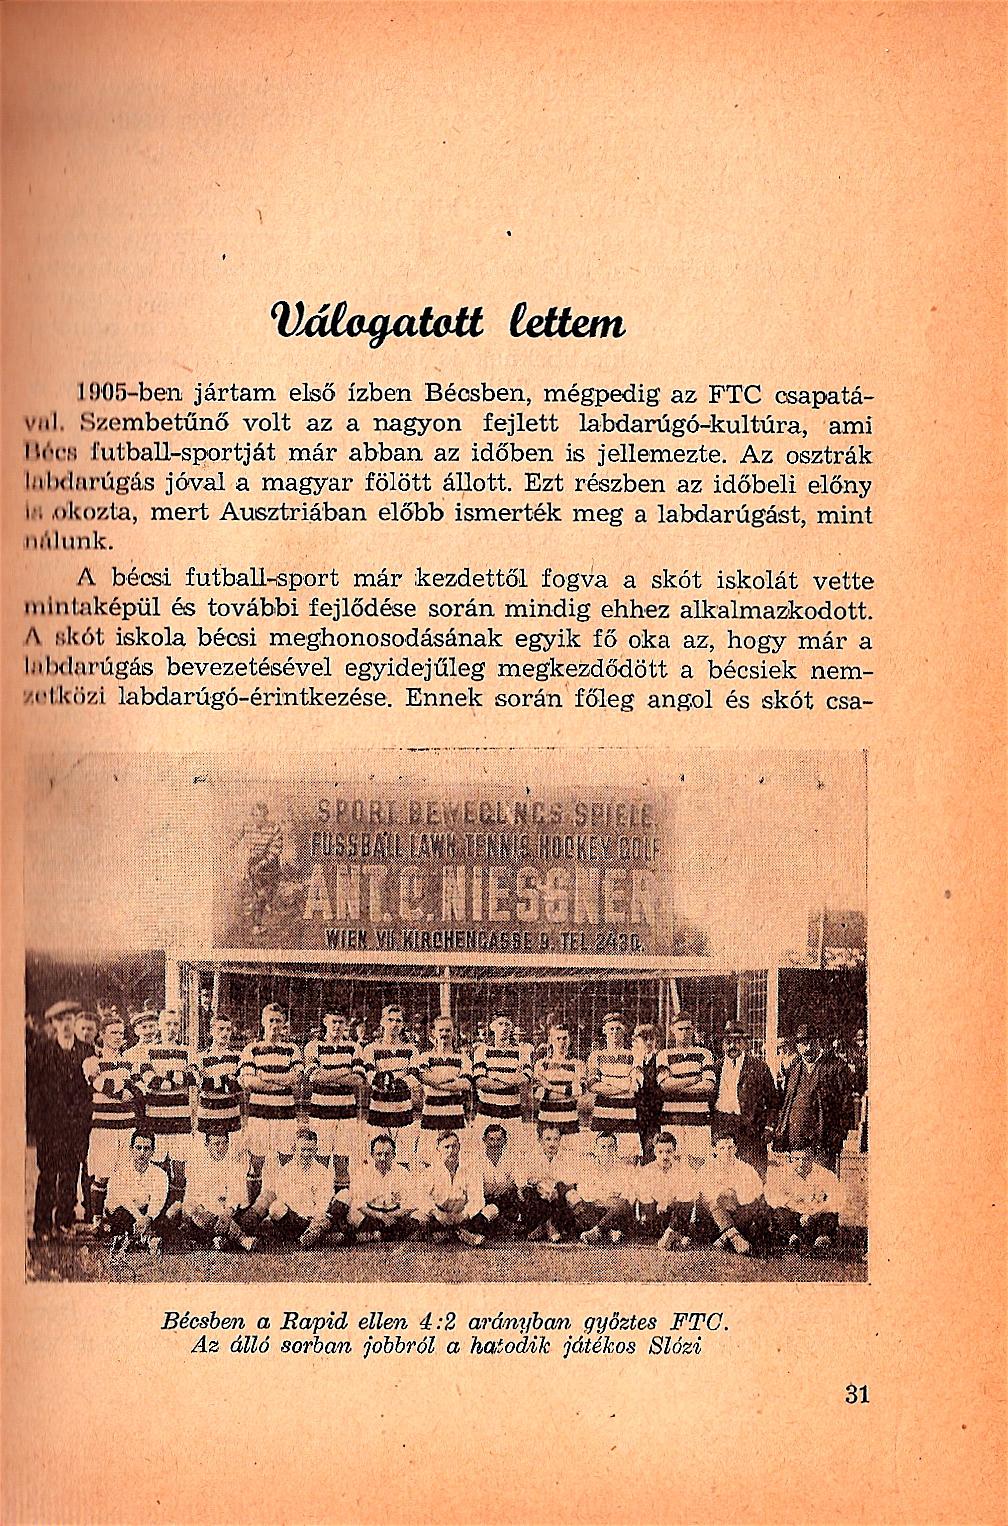 schlosser_fel-evszazad_1957_31_1102